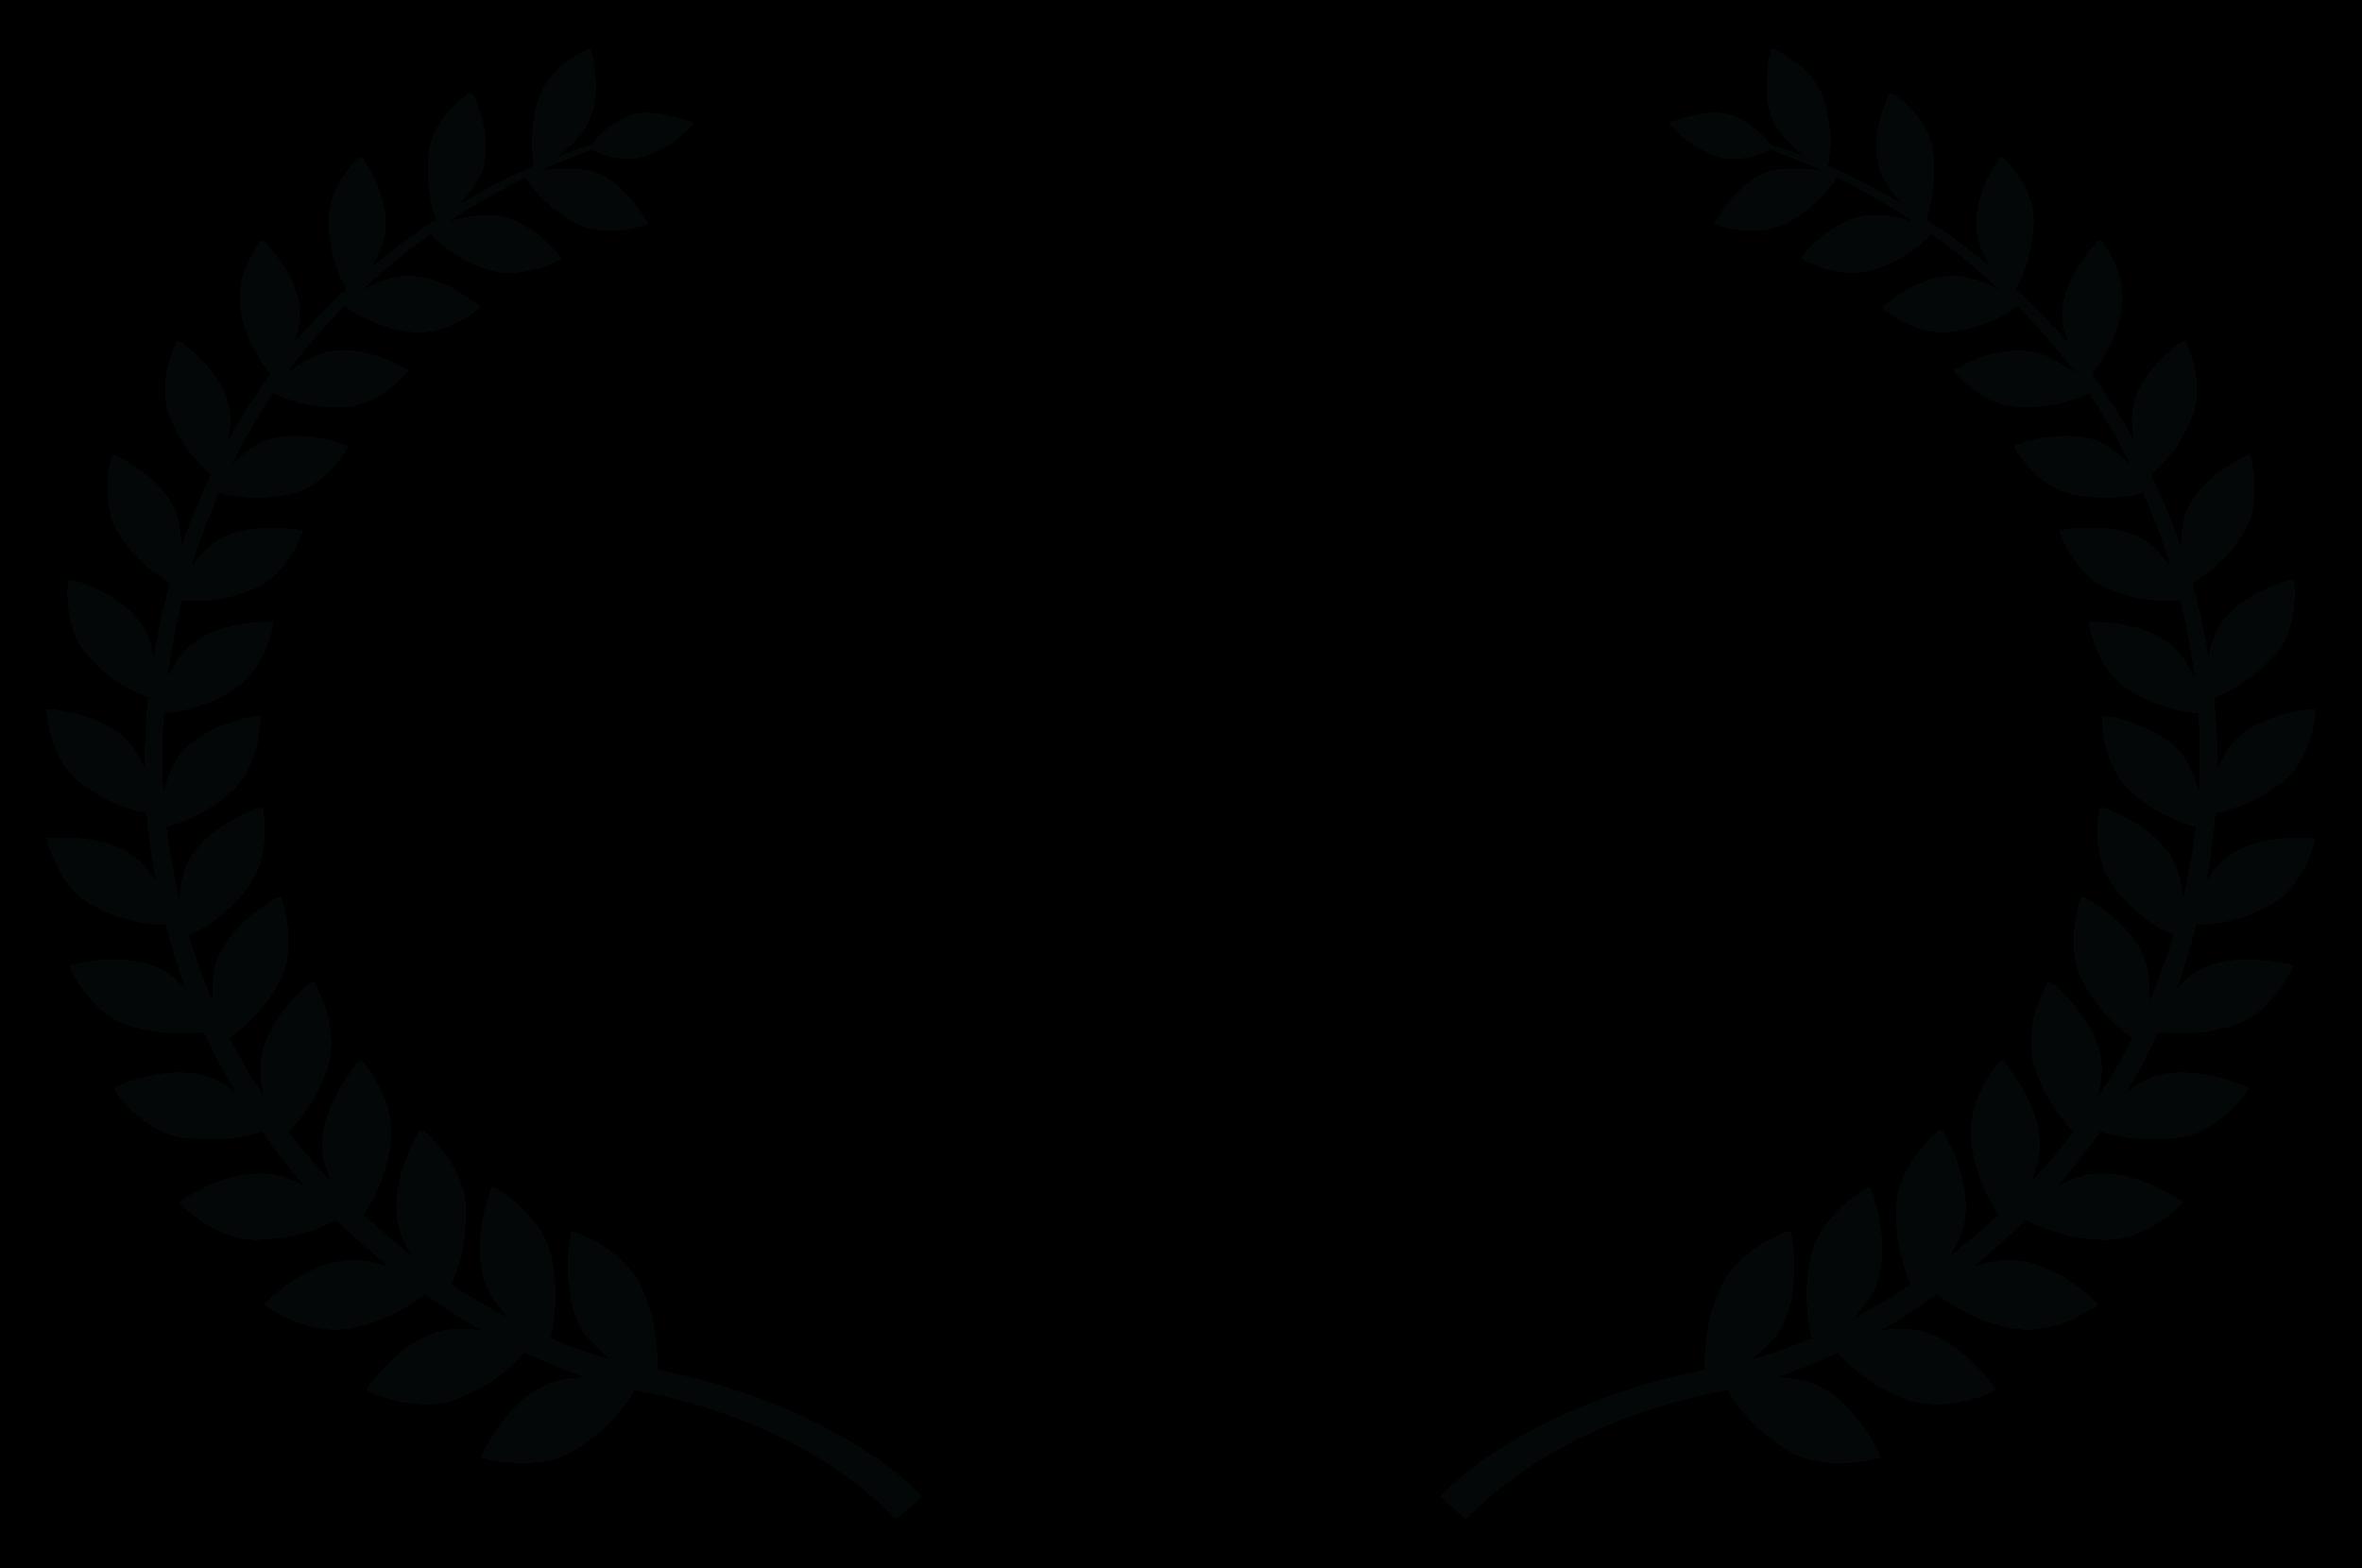 OFFICIALSELECTION-RidgefieldIndependentFilmFestival-2018.png